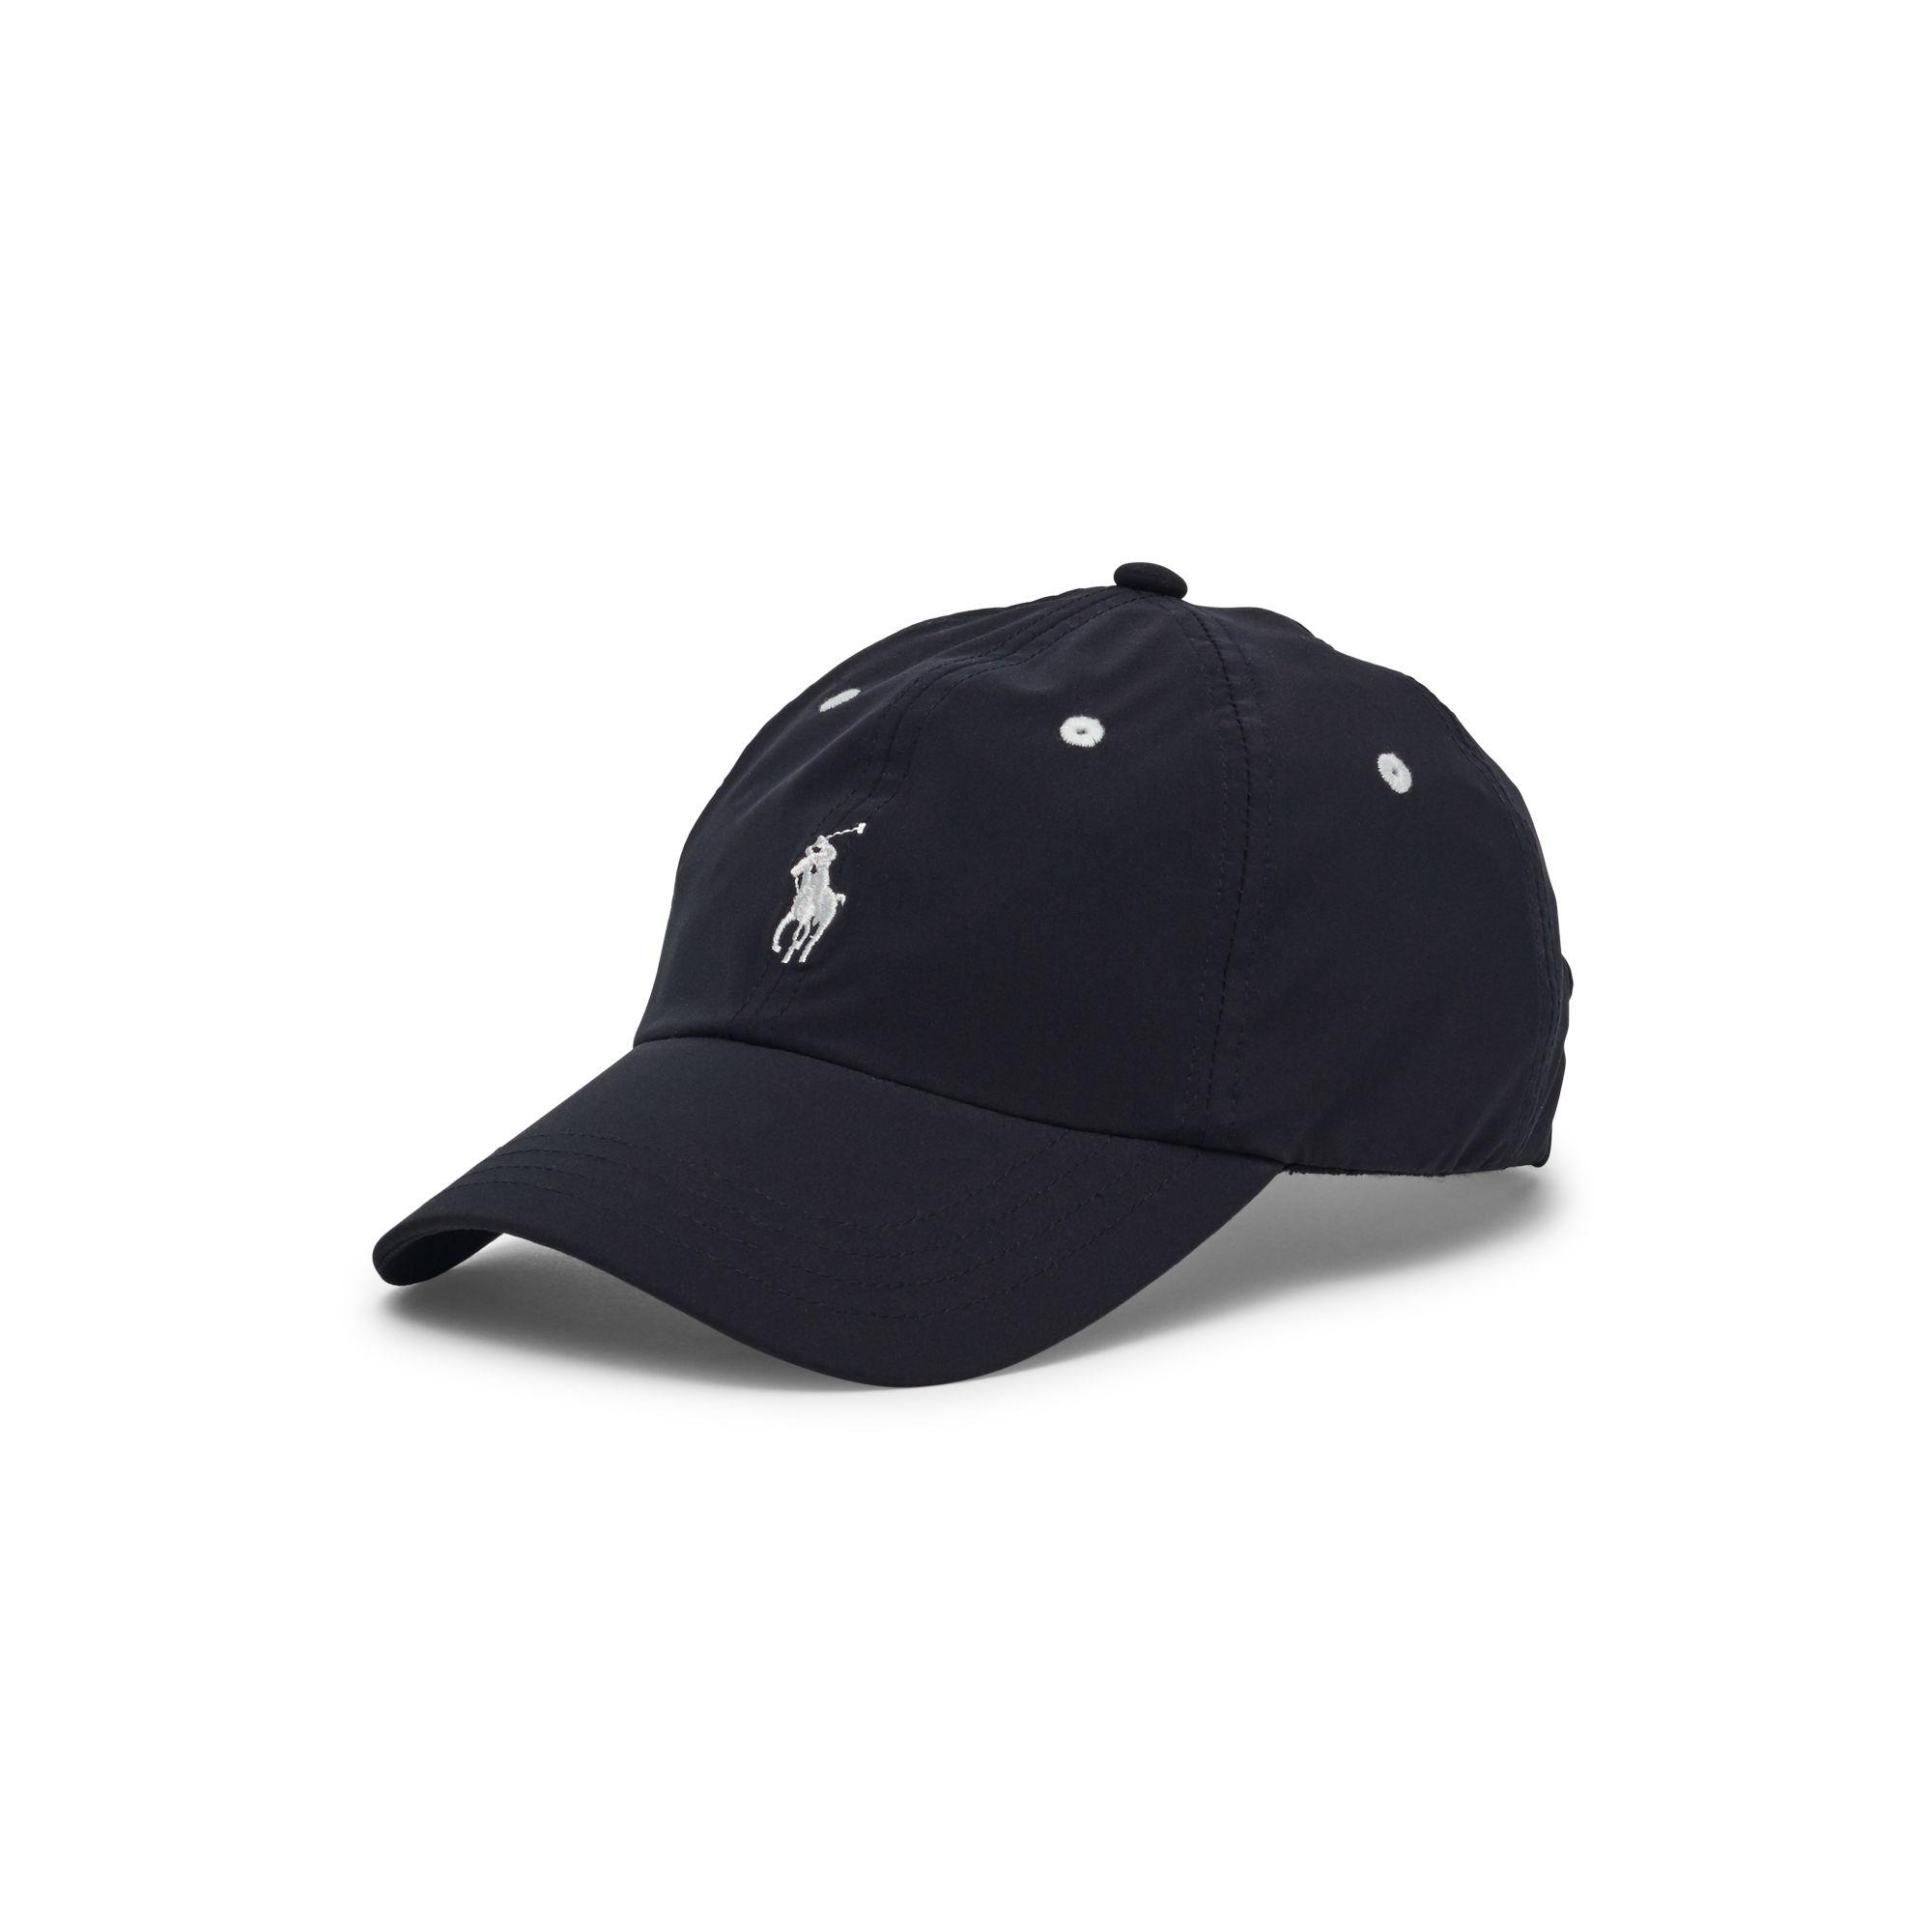 ralph lauren golf terry headband golf cap in black lyst. Black Bedroom Furniture Sets. Home Design Ideas